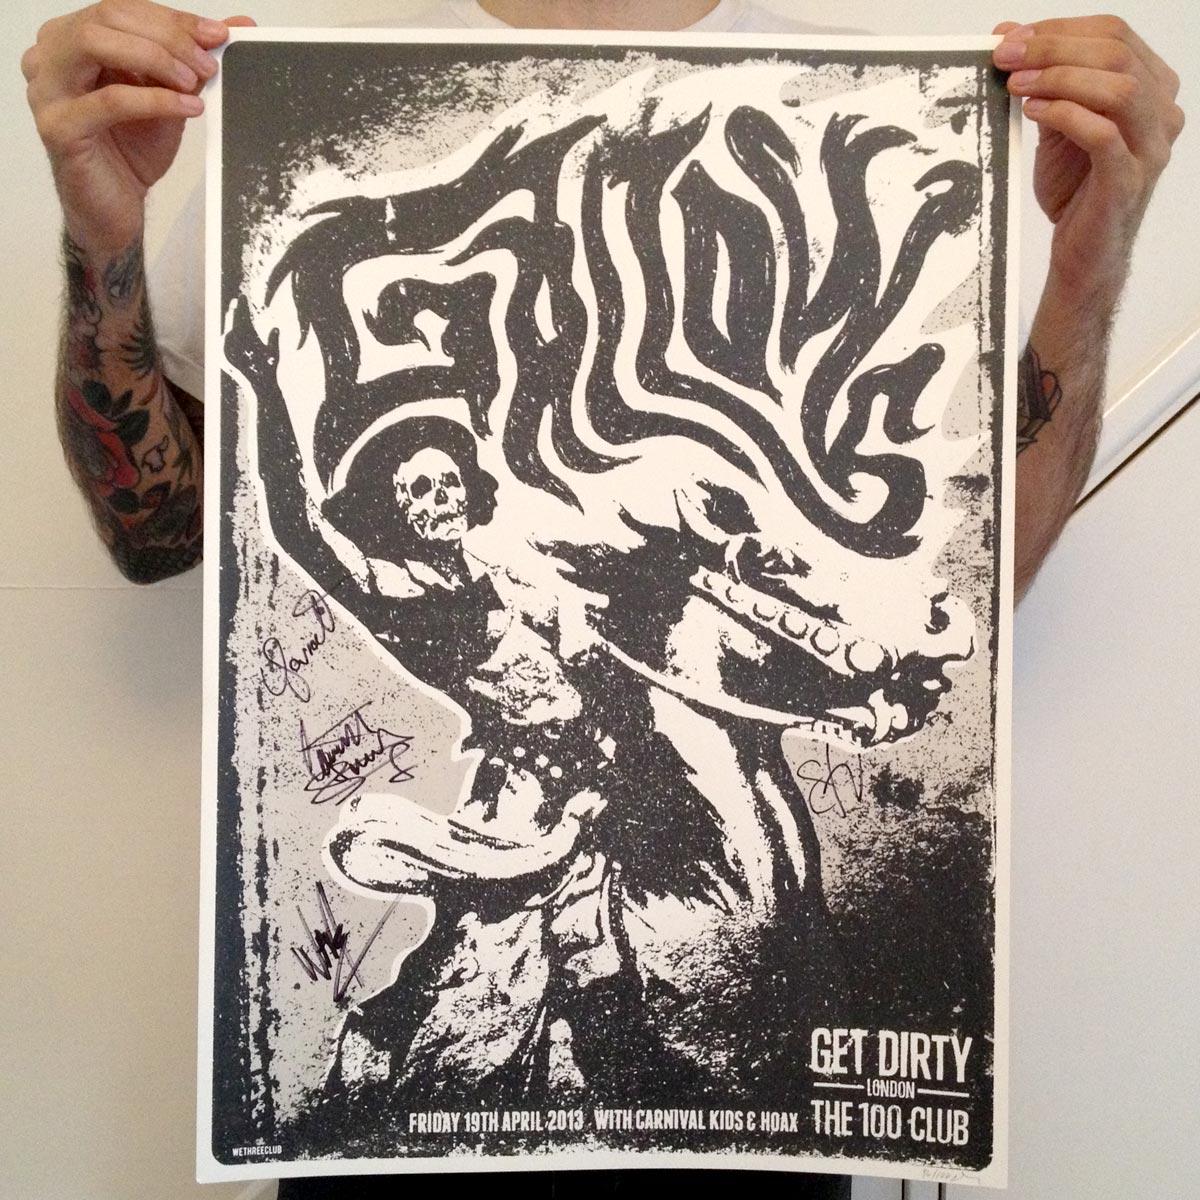 100 Club, London - April 2013 - Gallows Poster - Venn Records